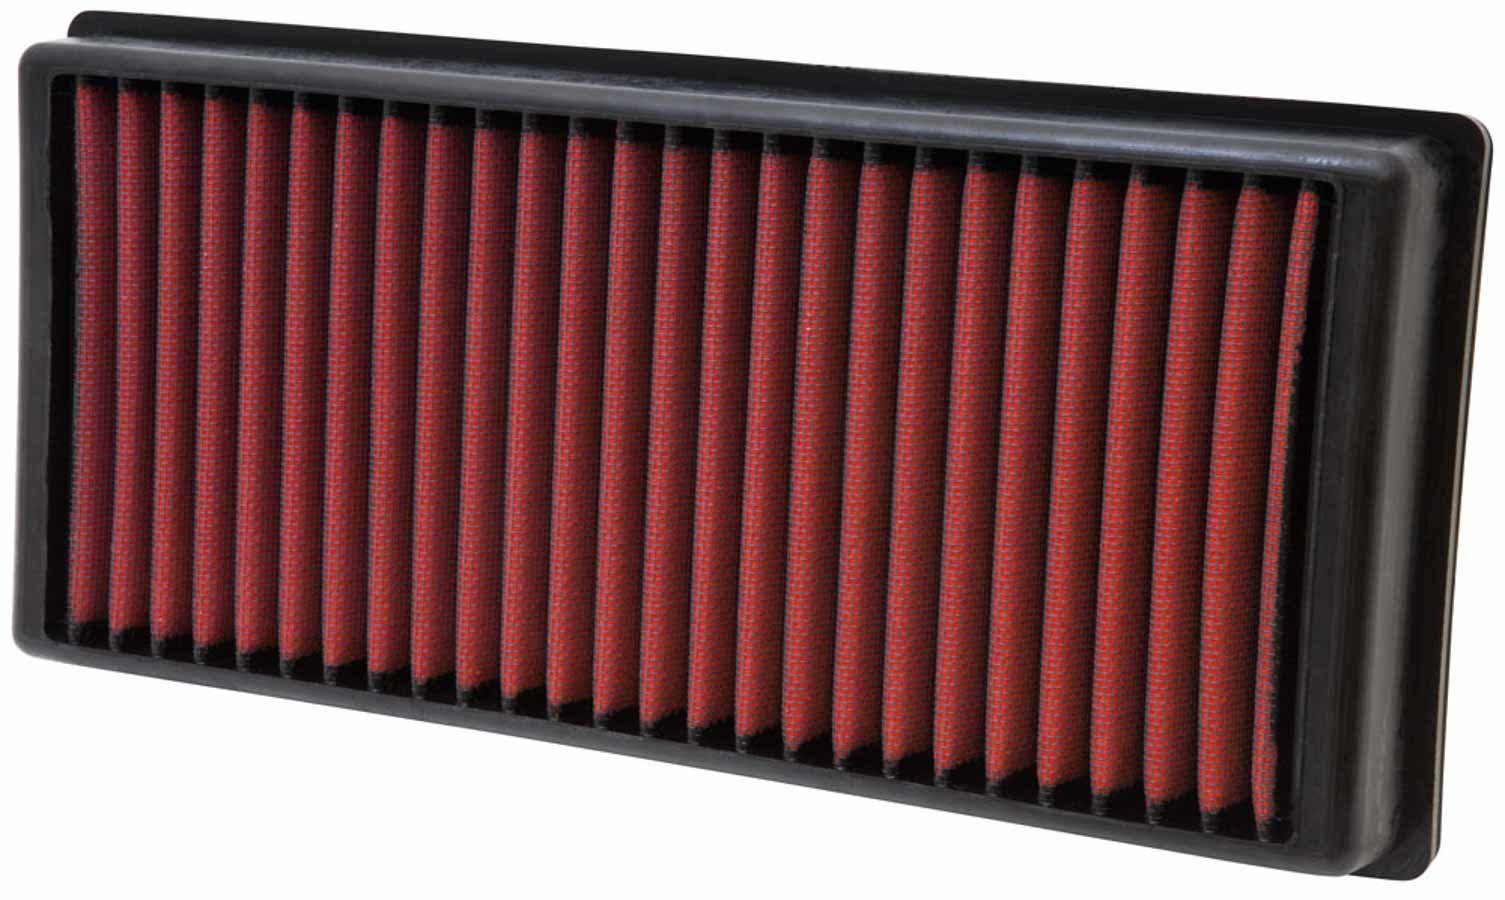 Aem 96-06 Jeep Wrangler 2.5/ 4.0L Air Filter